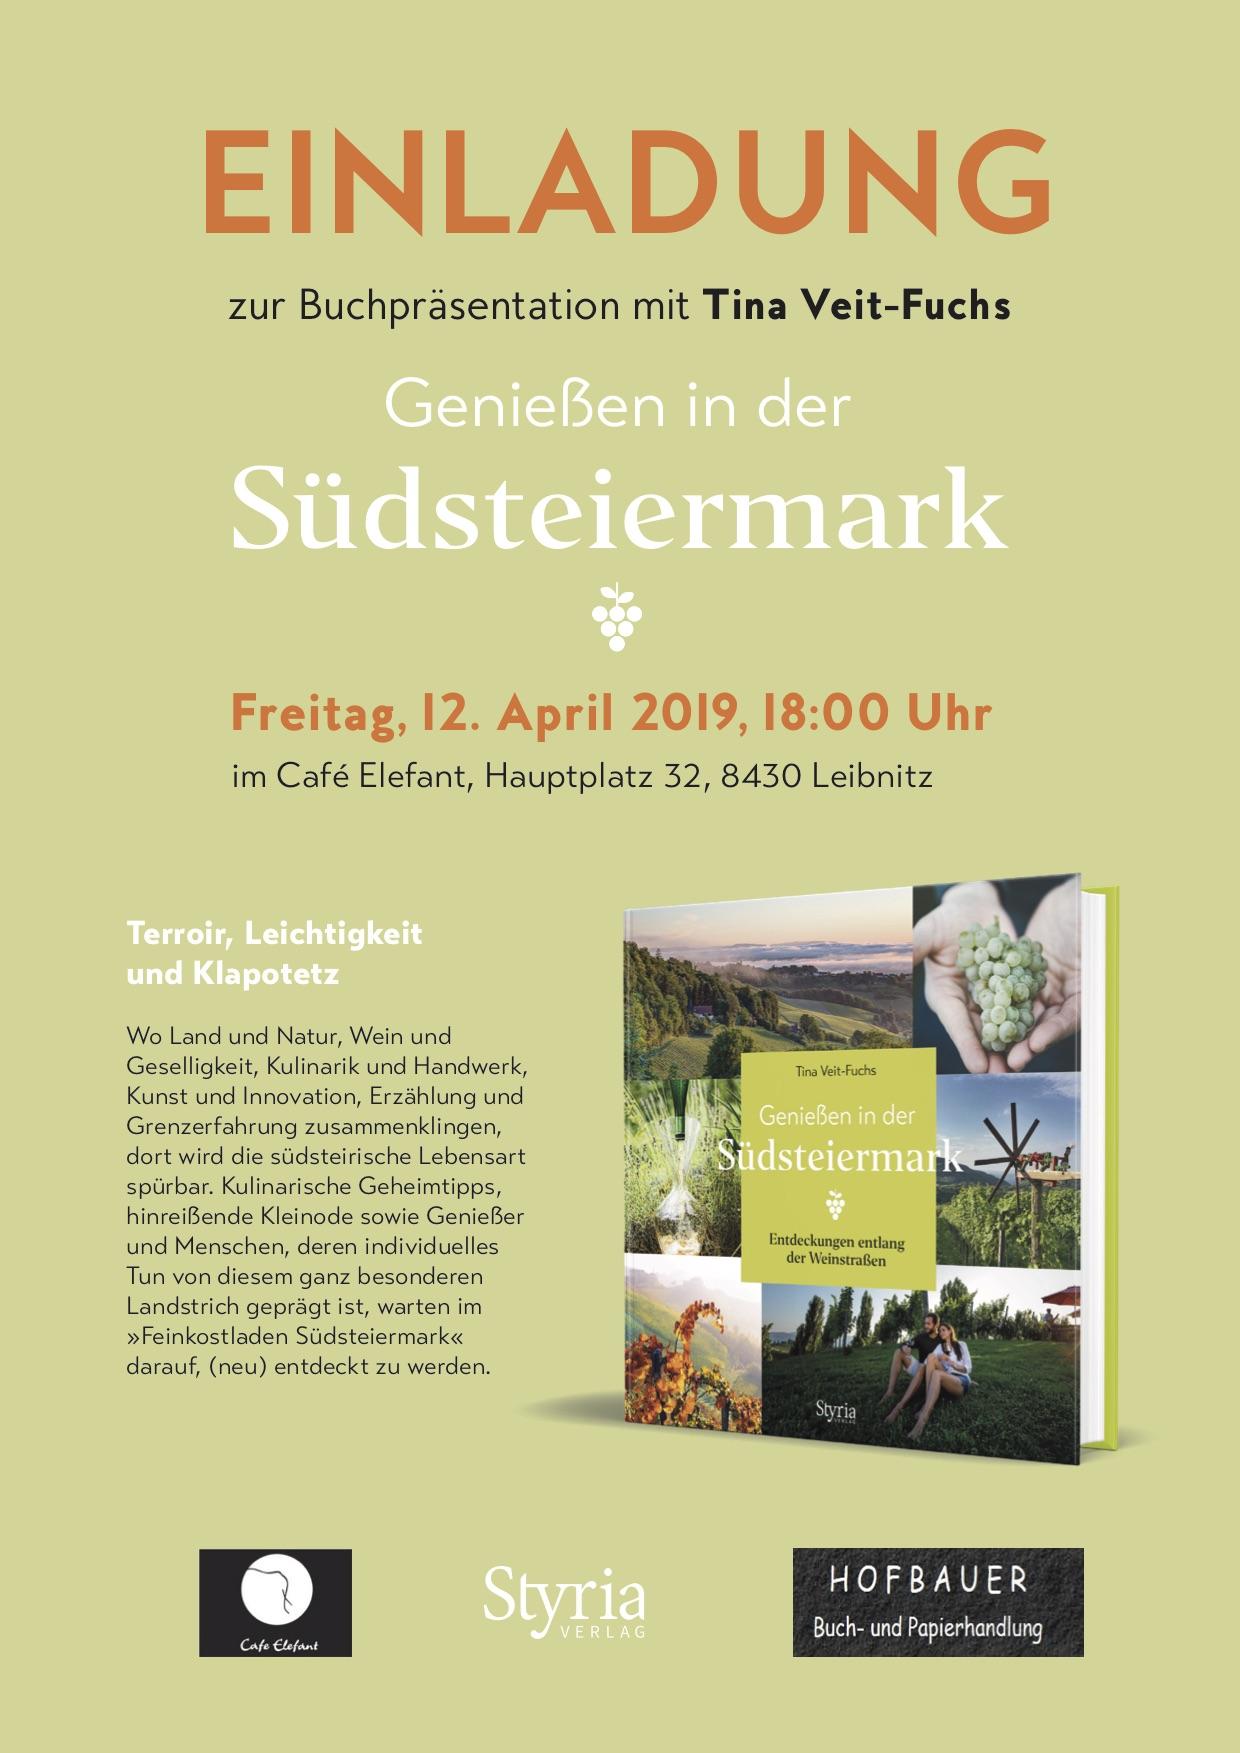 Einladung_Sudsteiermark_12_April1jpg